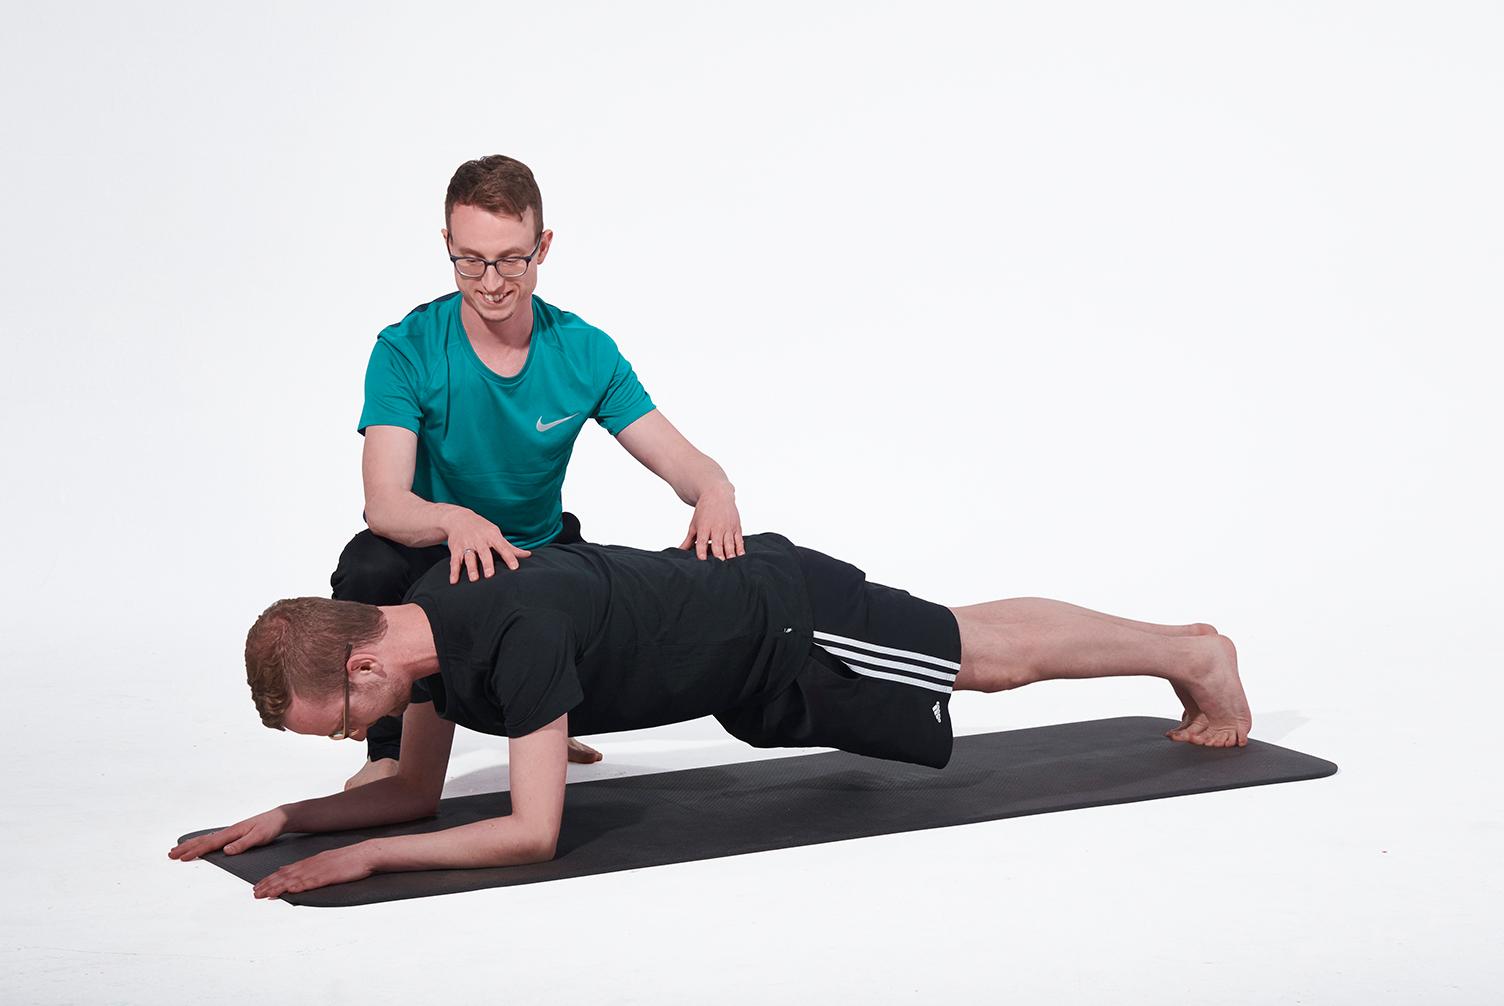 Personal Training Muenchen_Rueckentraining und Bauch Core Workout